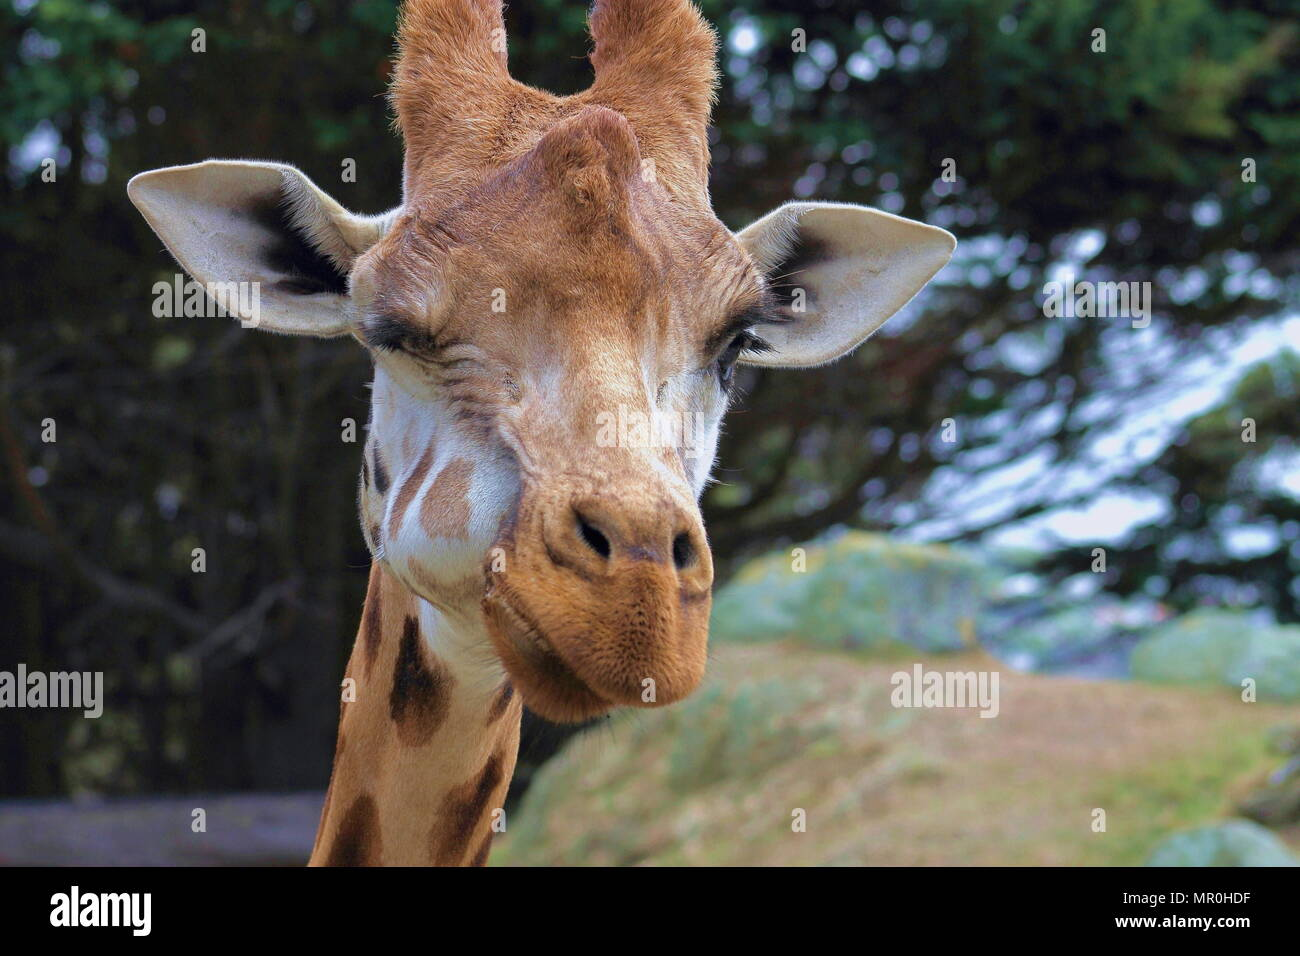 Nahaufnahme einer Giraffe (Giraffa Camelopardalis) Zwinkerndes Stockbild